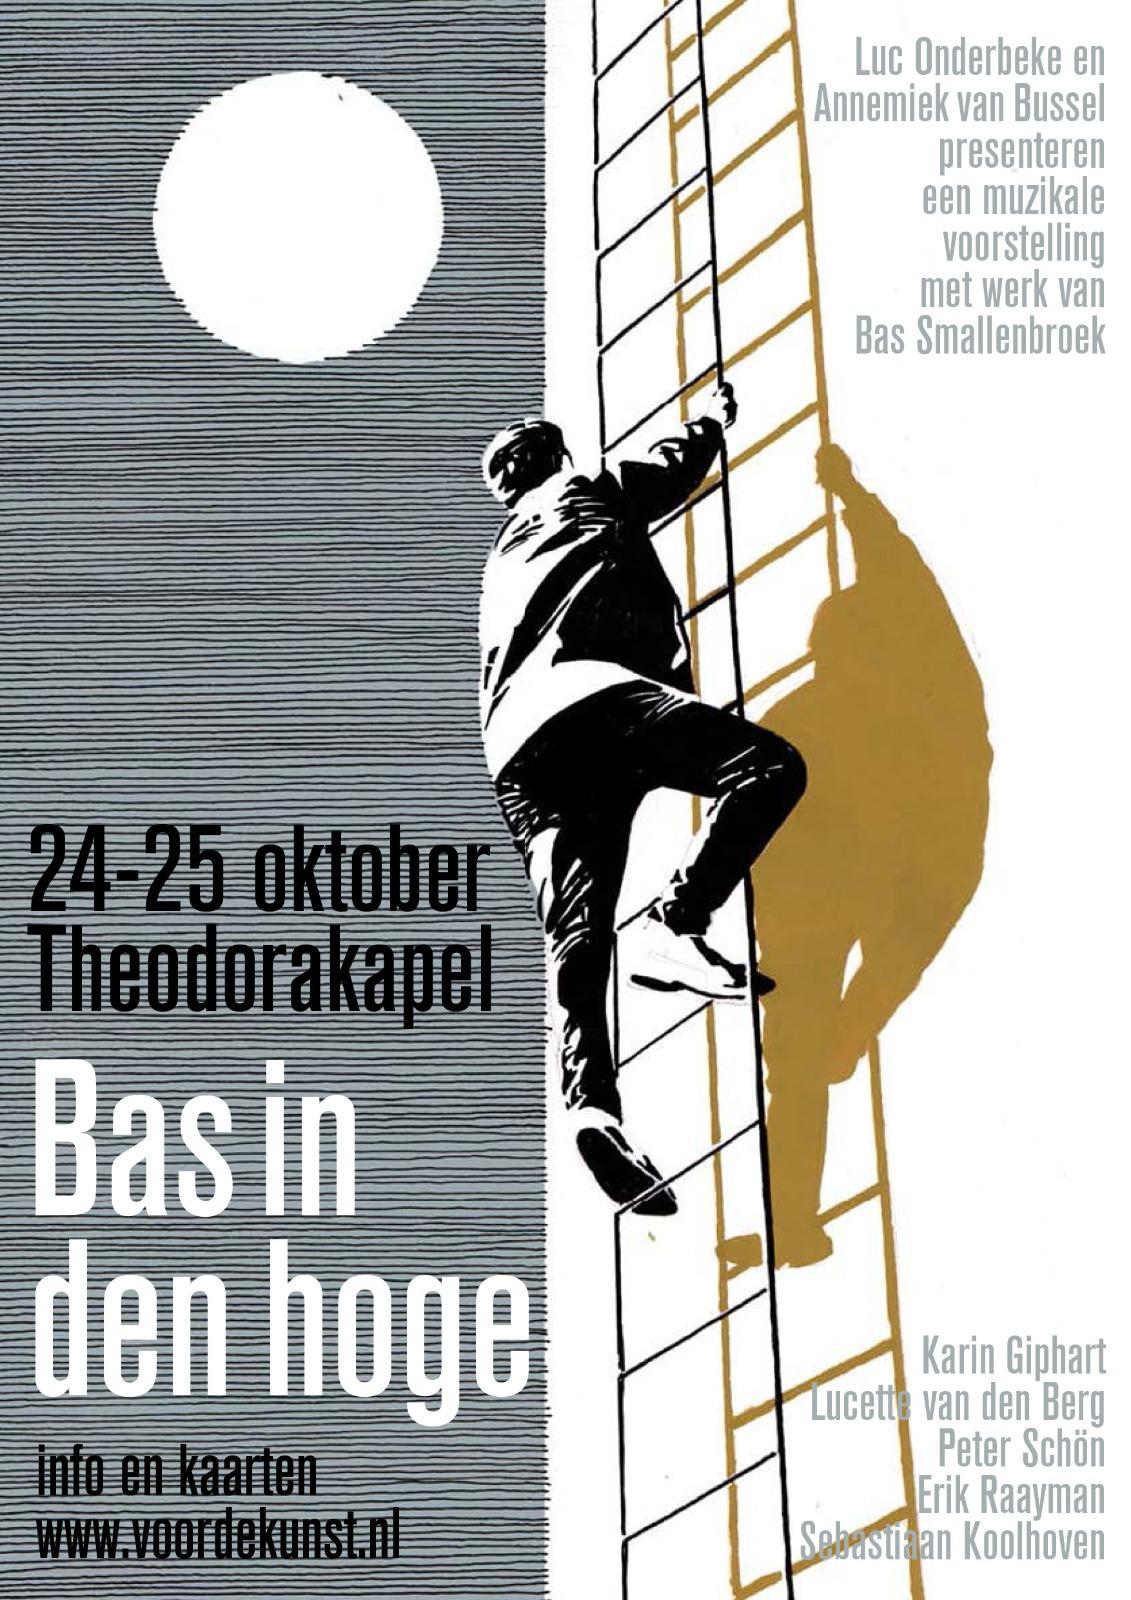 Bas_in_den_Hoge.jpg